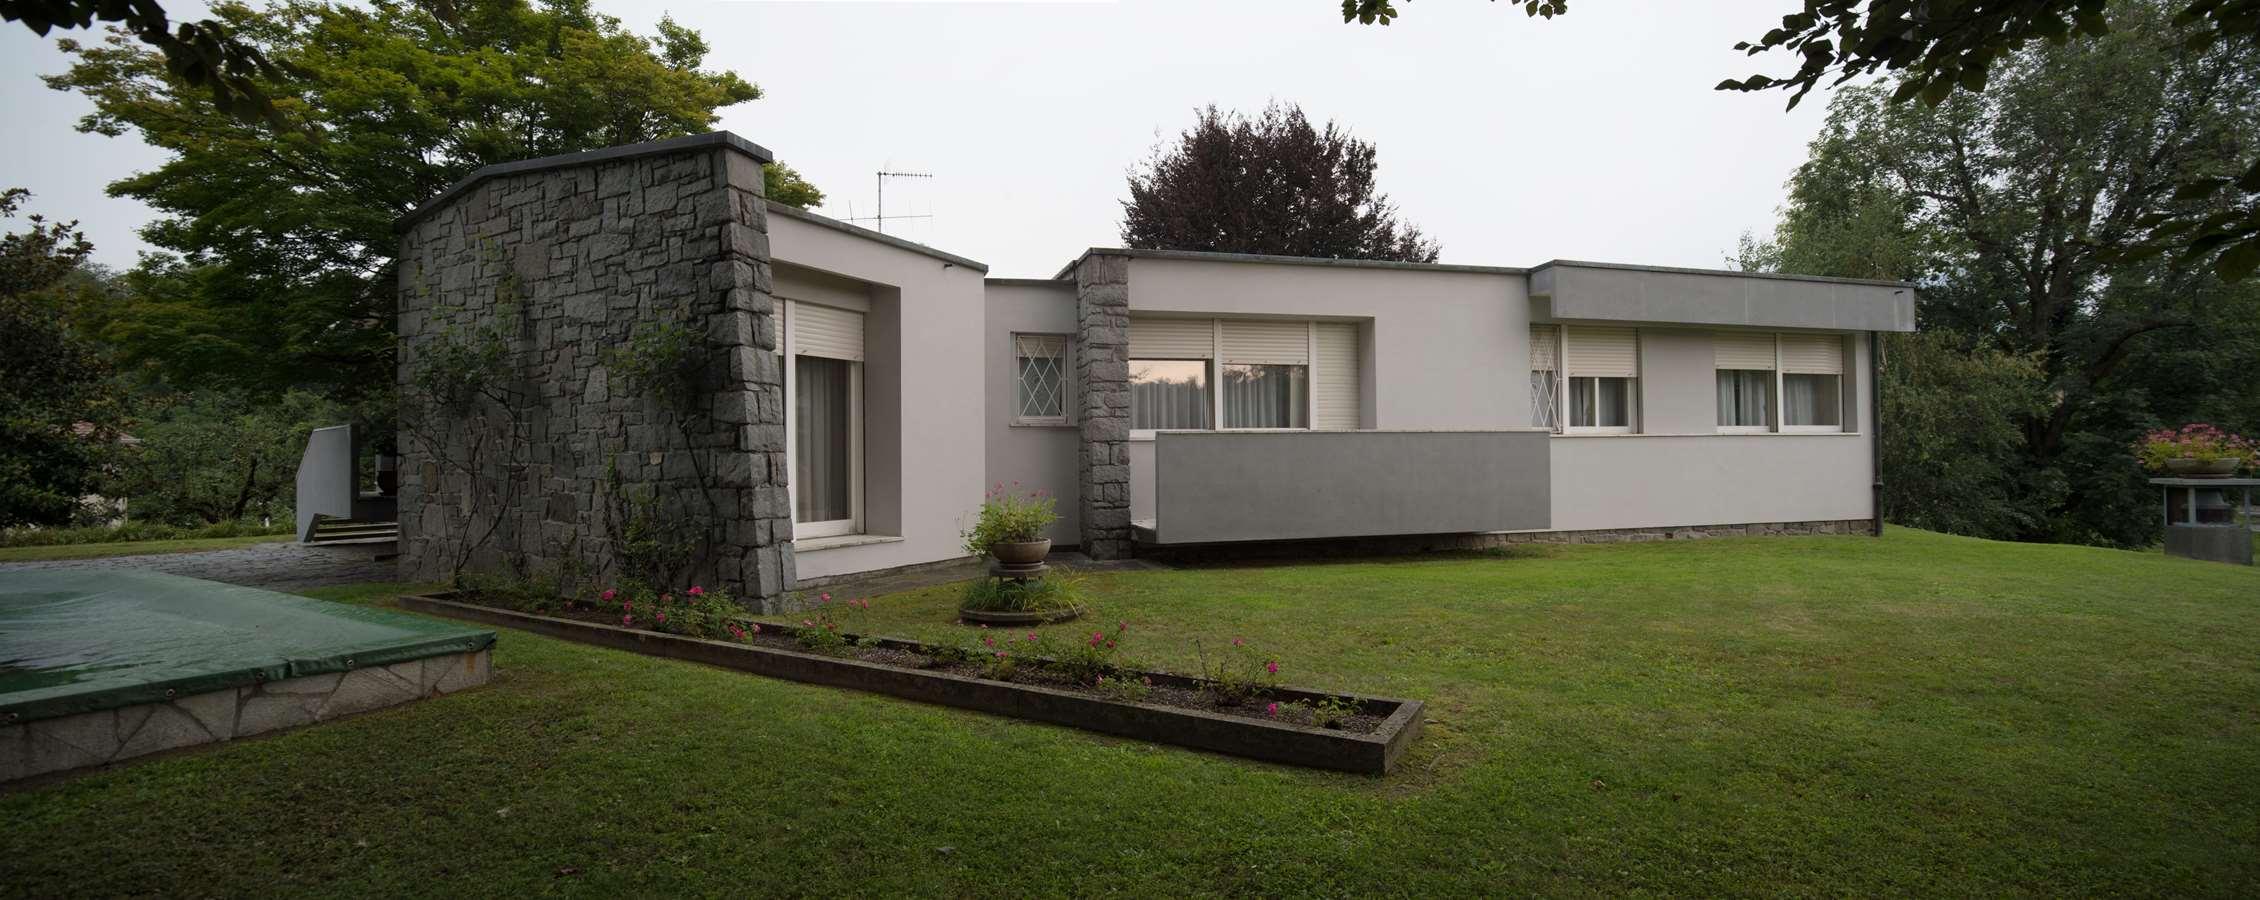 Villa Capellaro